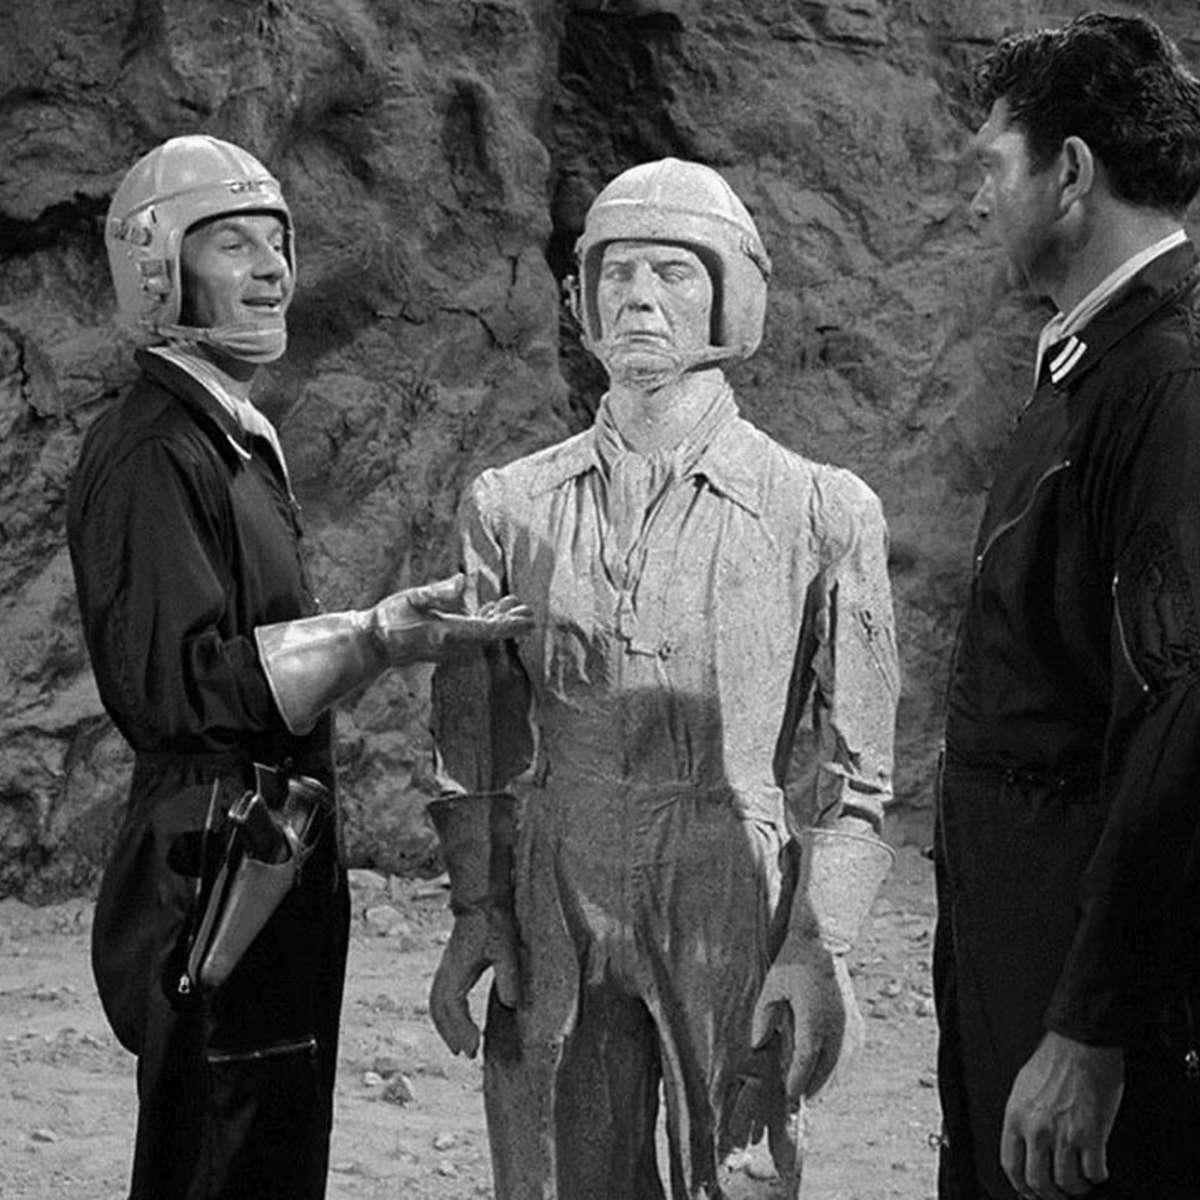 Twilight Zone The Little People hero